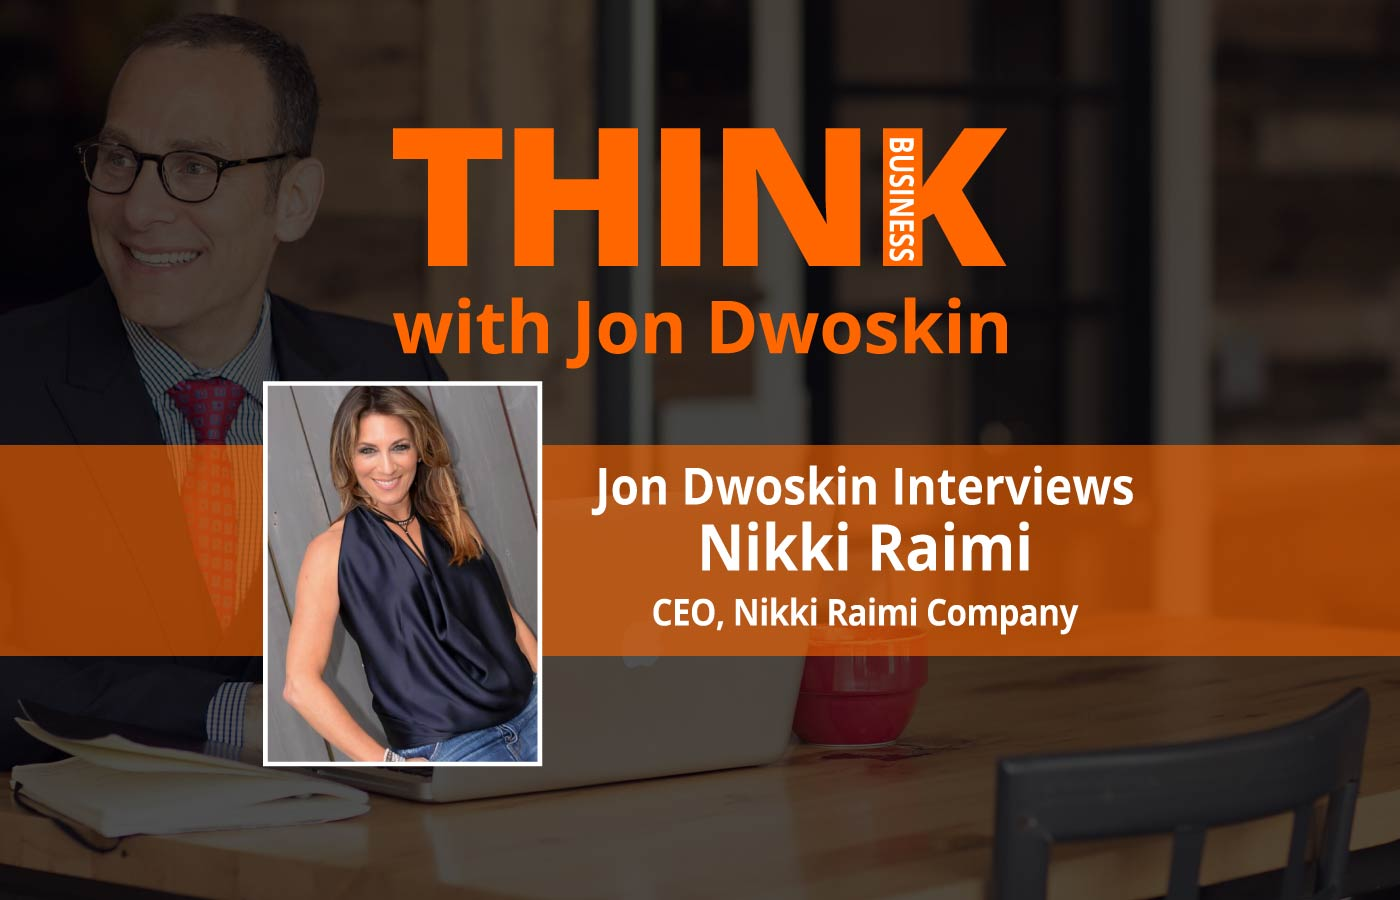 THINK Business: Jon Dwoskin Interviews Nikki Raimi CEO of Nikki Raimi Company